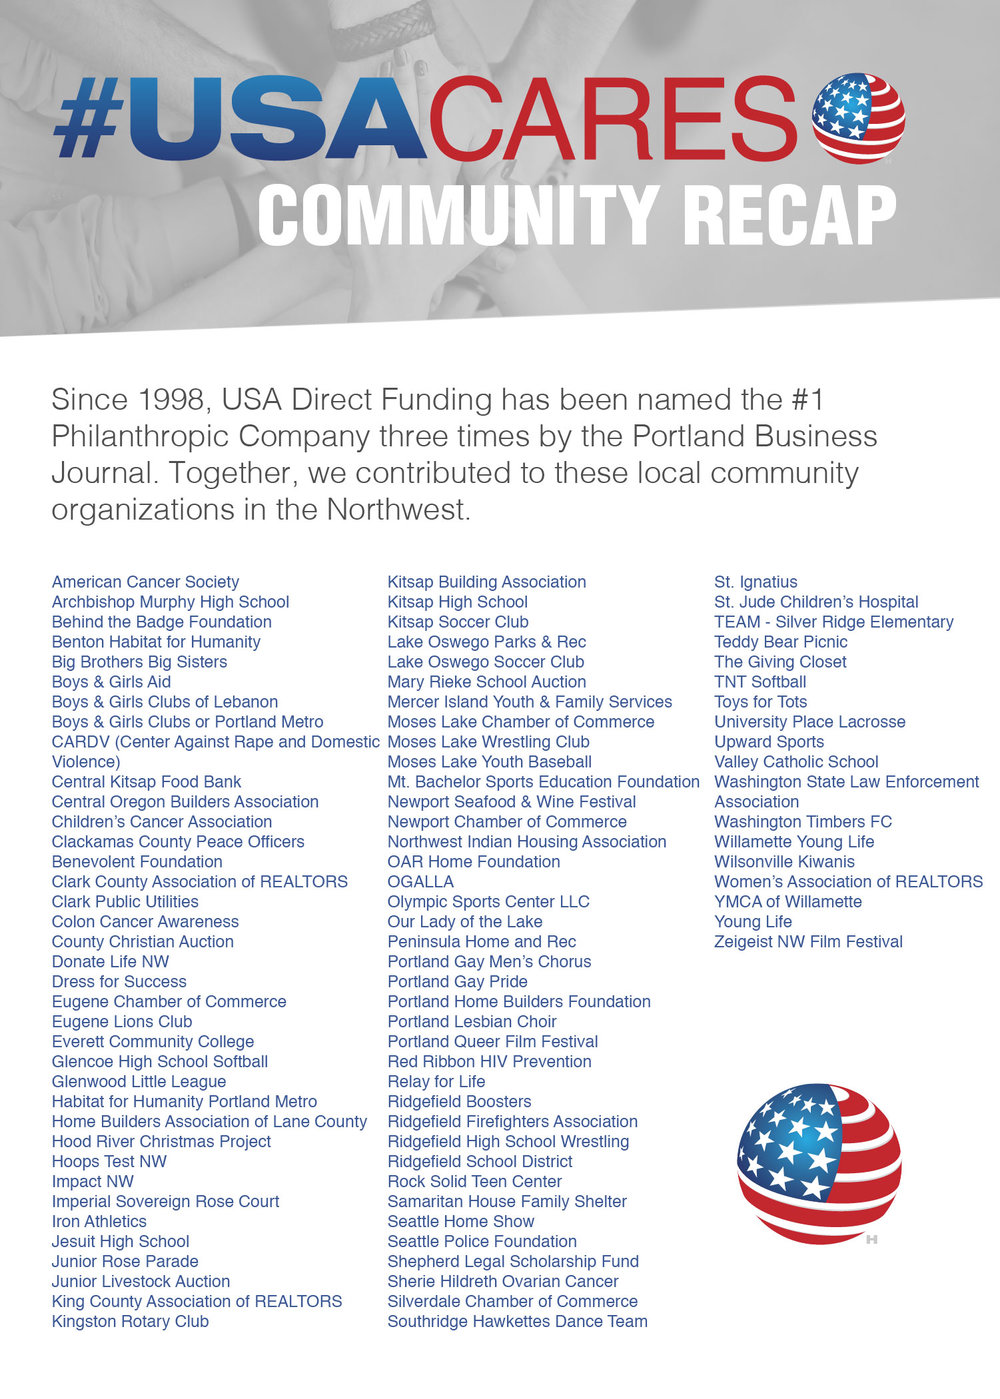 USA_Cares_Donations-01.jpg